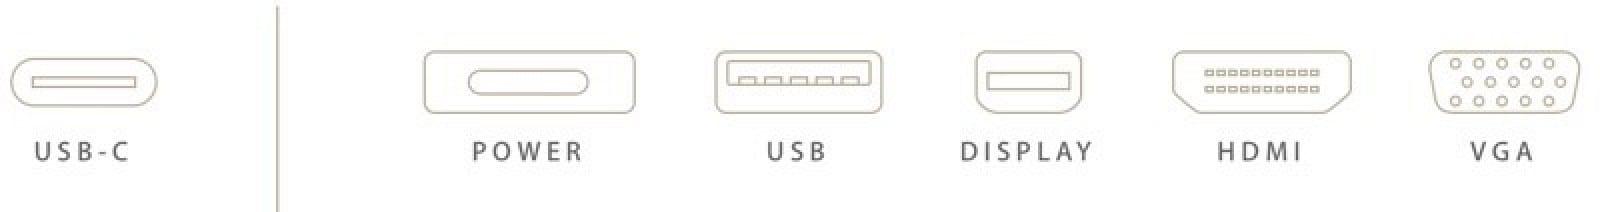 USB-C חיבור חדש